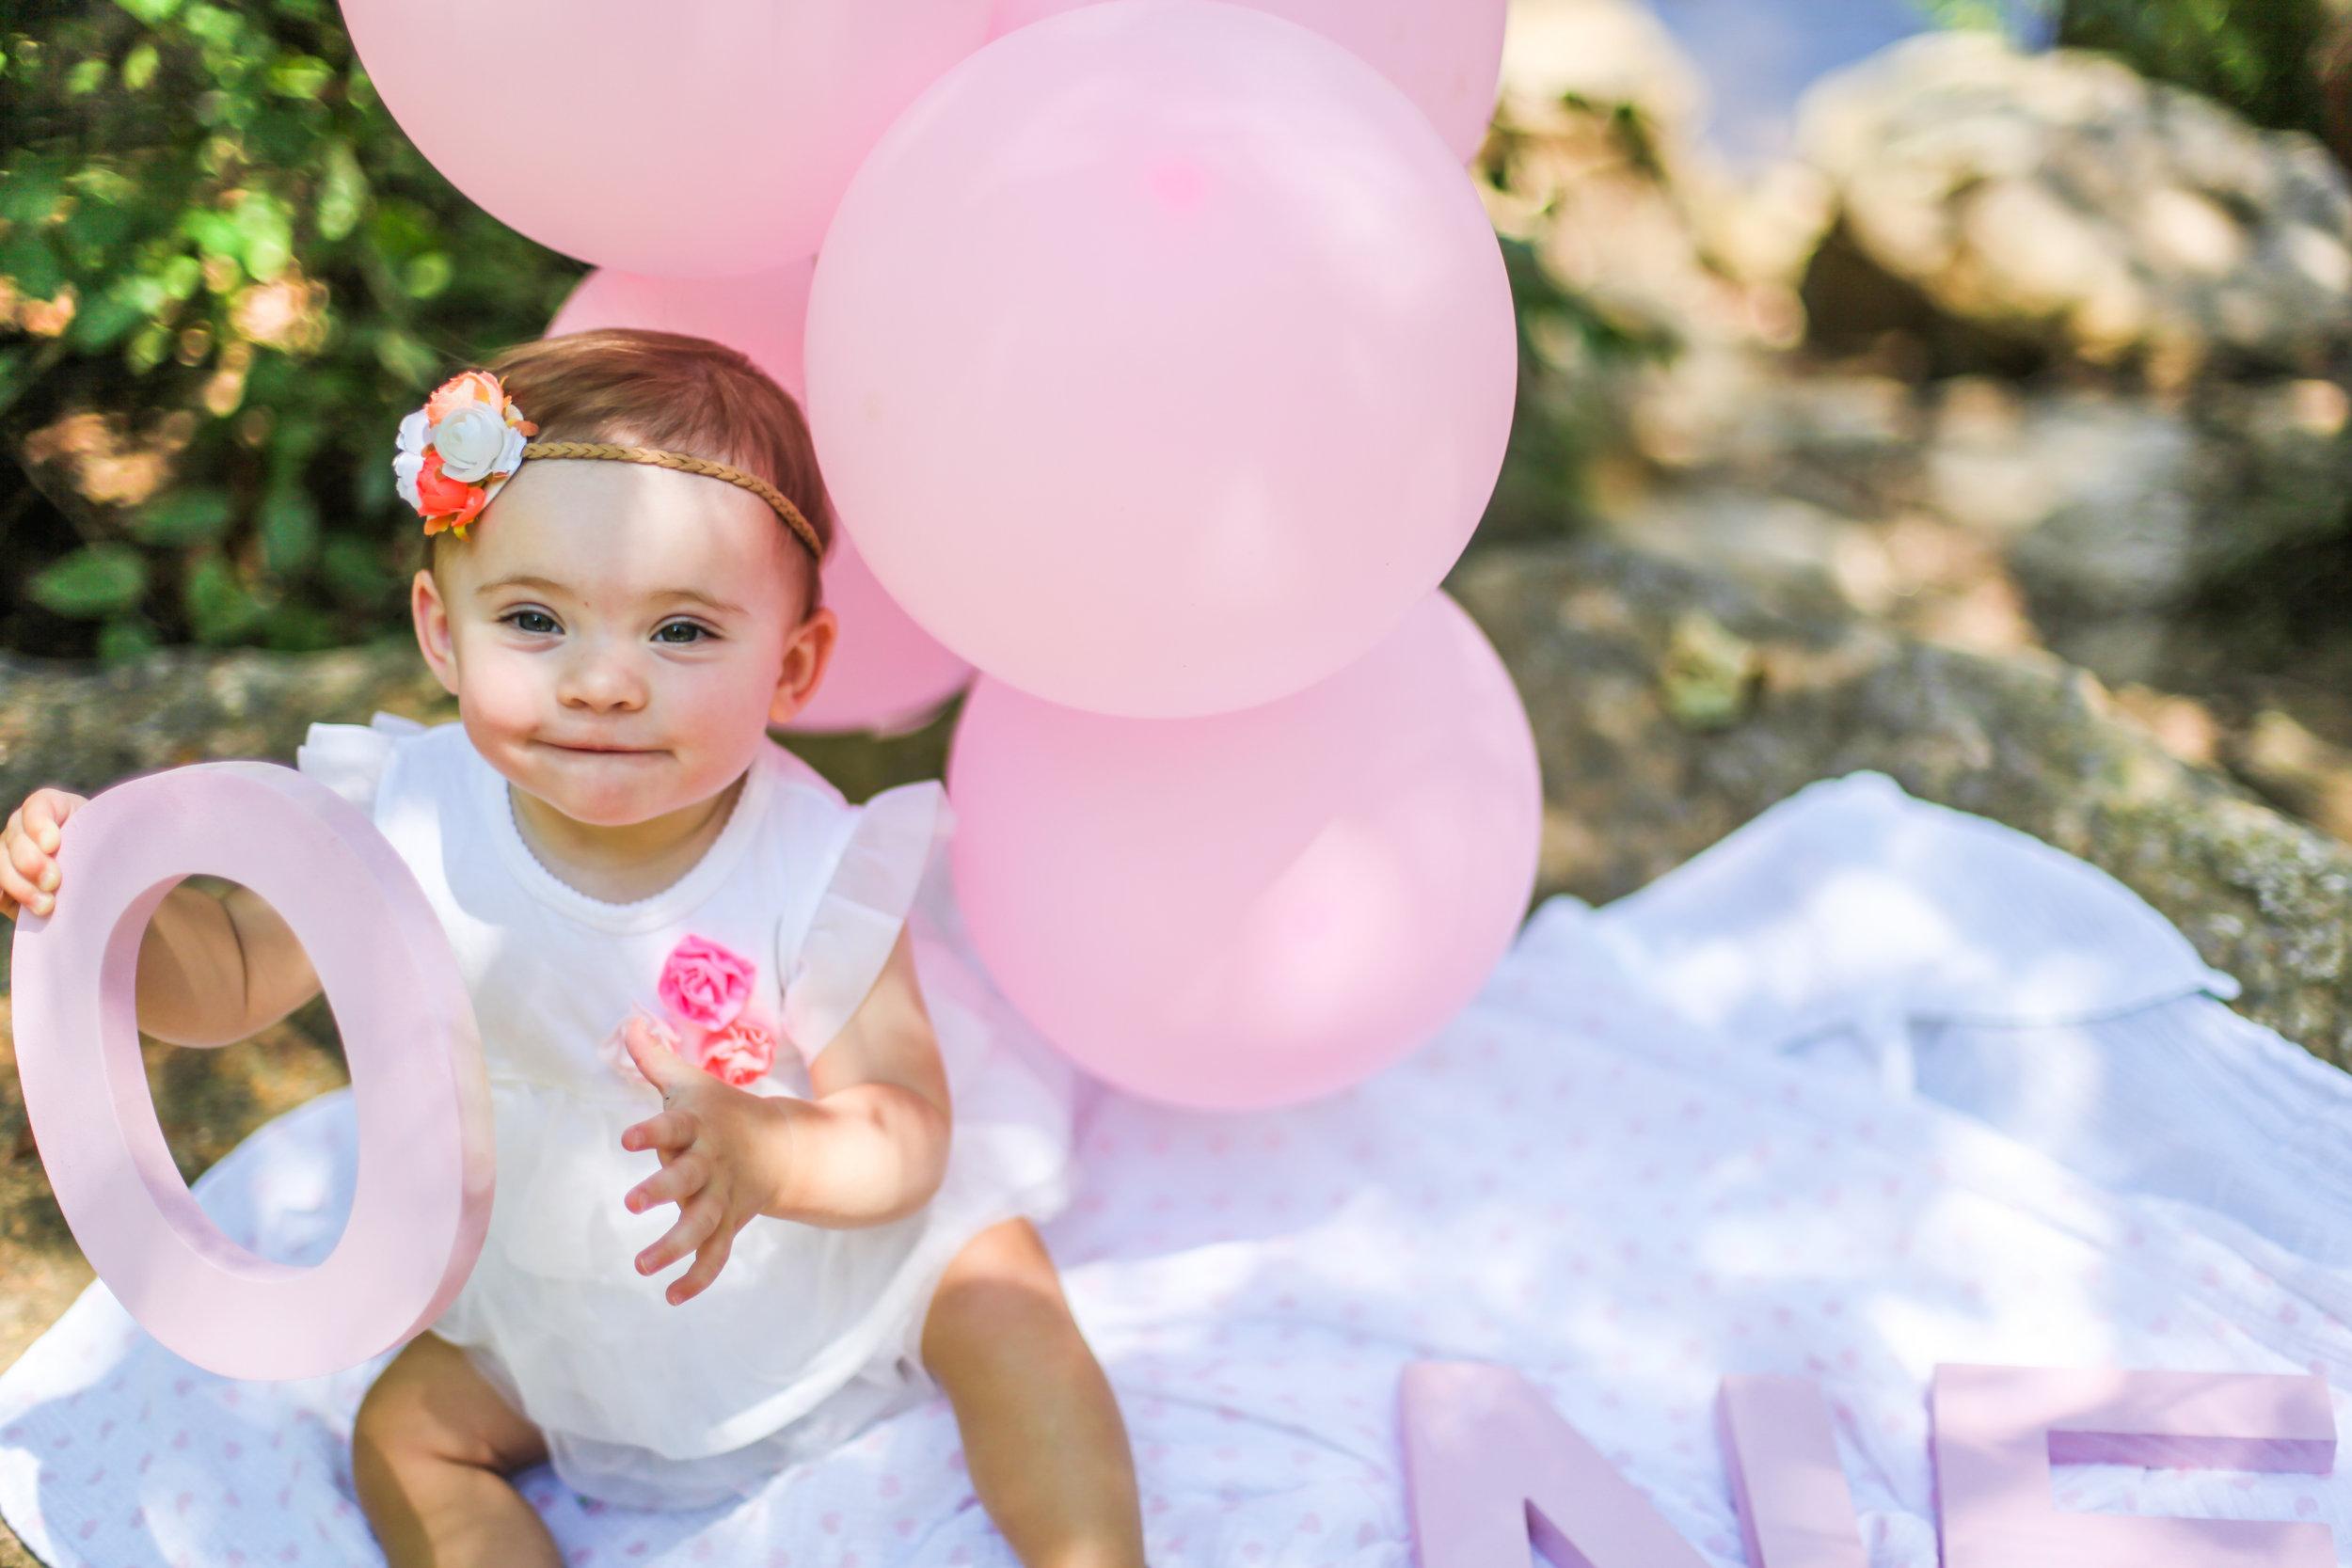 woodstock baby photography angela elliott-83.jpg